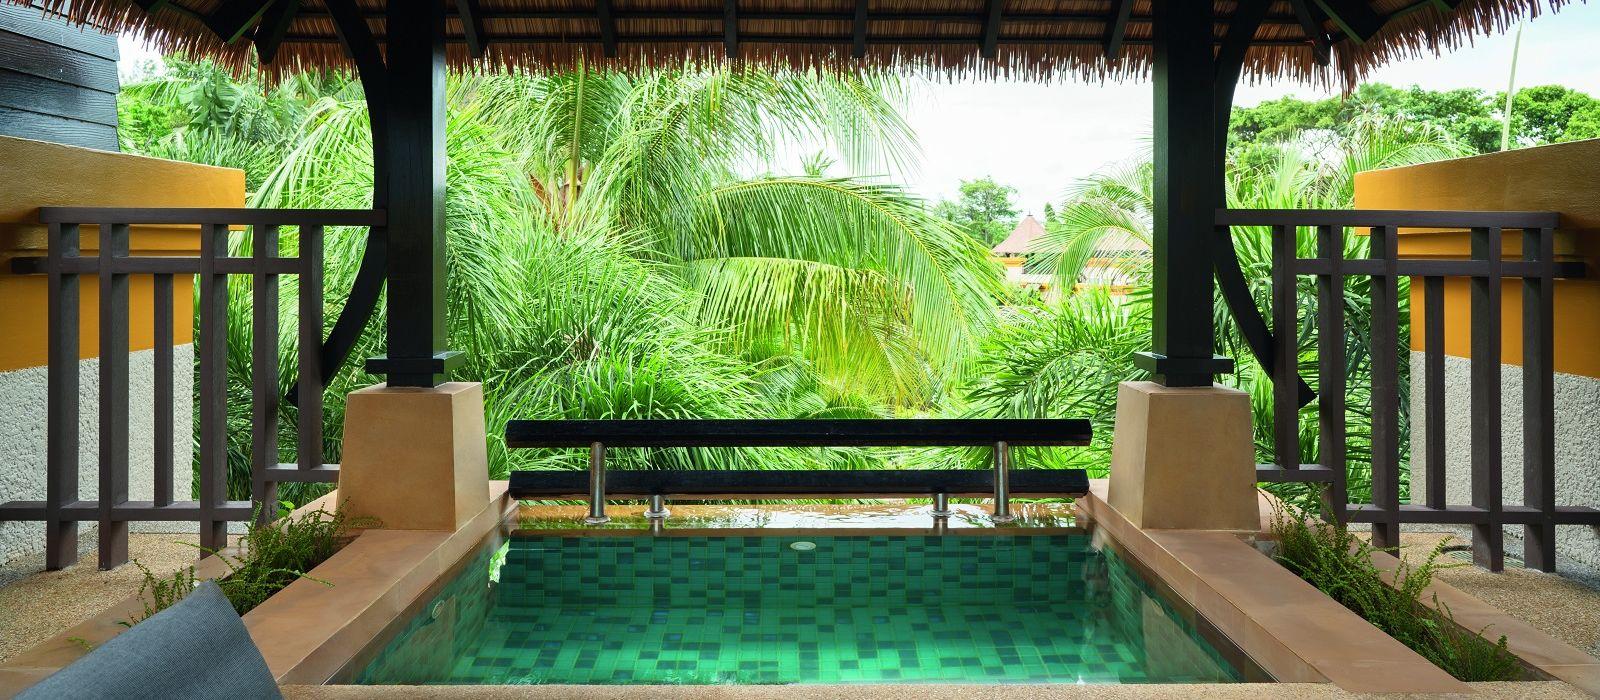 Hotel Movenpick Resort and Spa Karon Beach Thailand